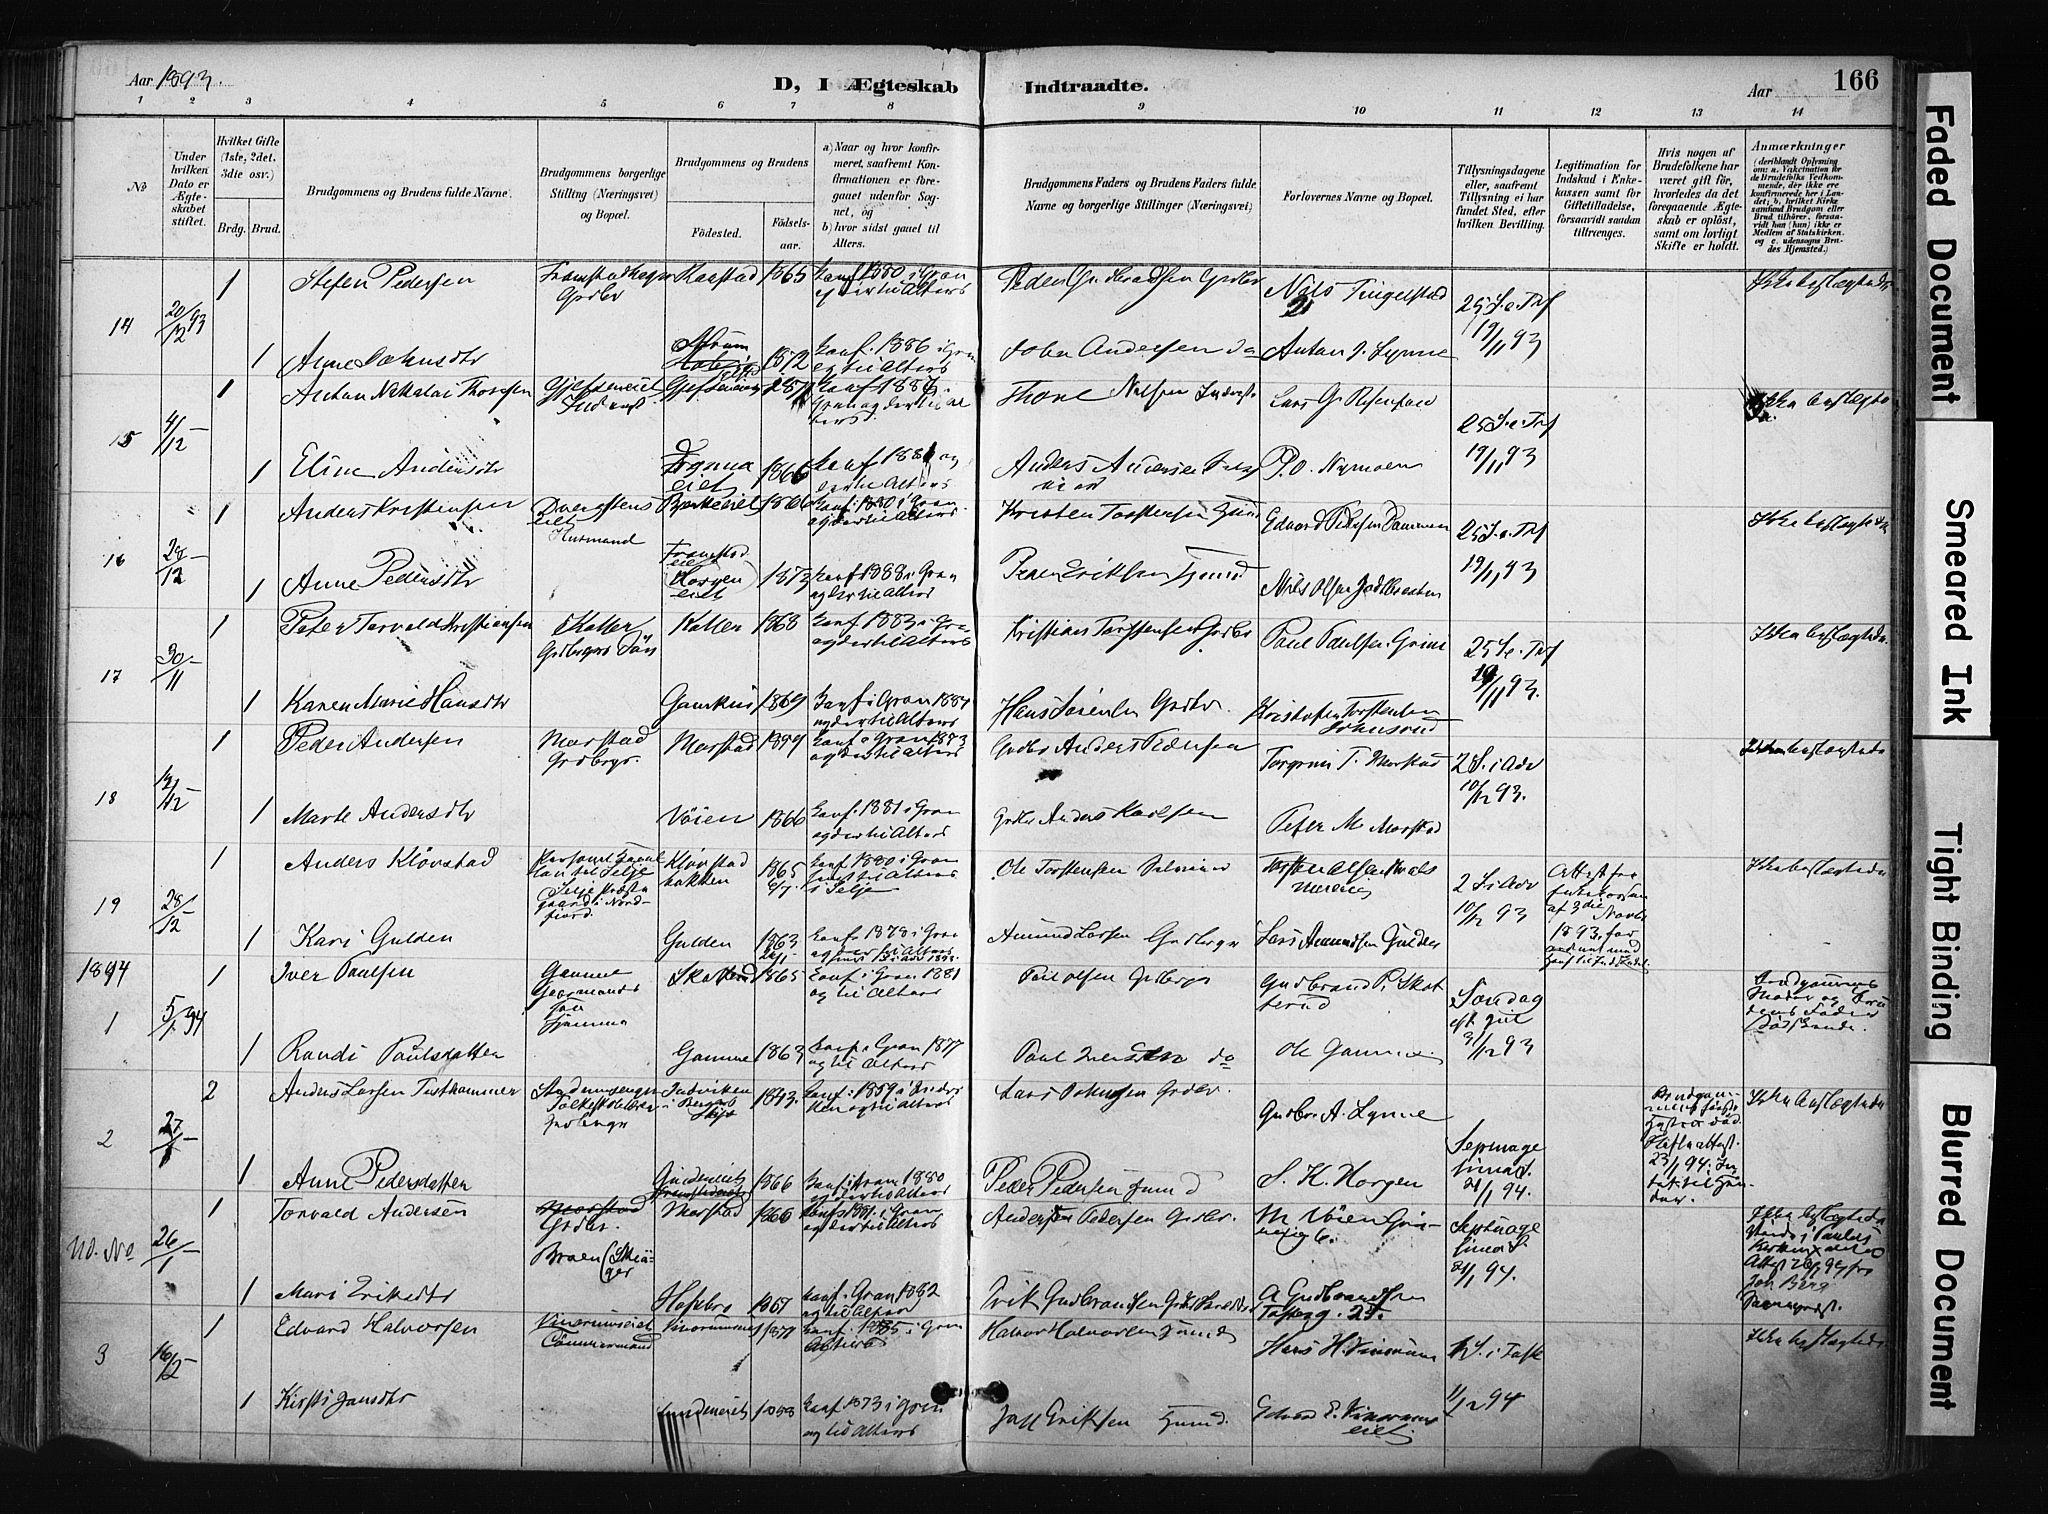 SAH, Gran prestekontor, Ministerialbok nr. 17, 1889-1897, s. 166